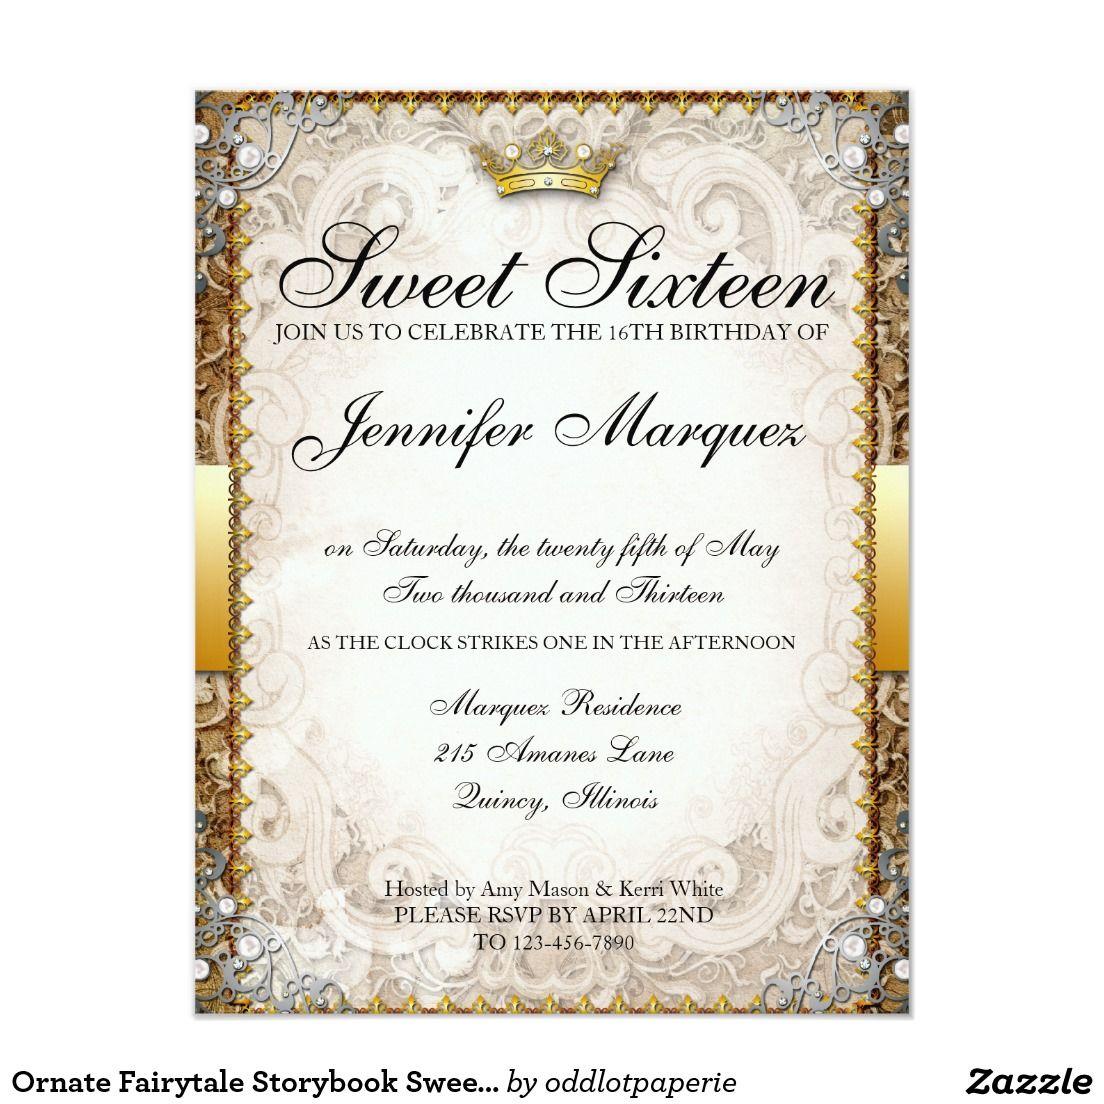 Ornate Fairytale Storybook Sweet Sixteen Invites   Sweet sixteen